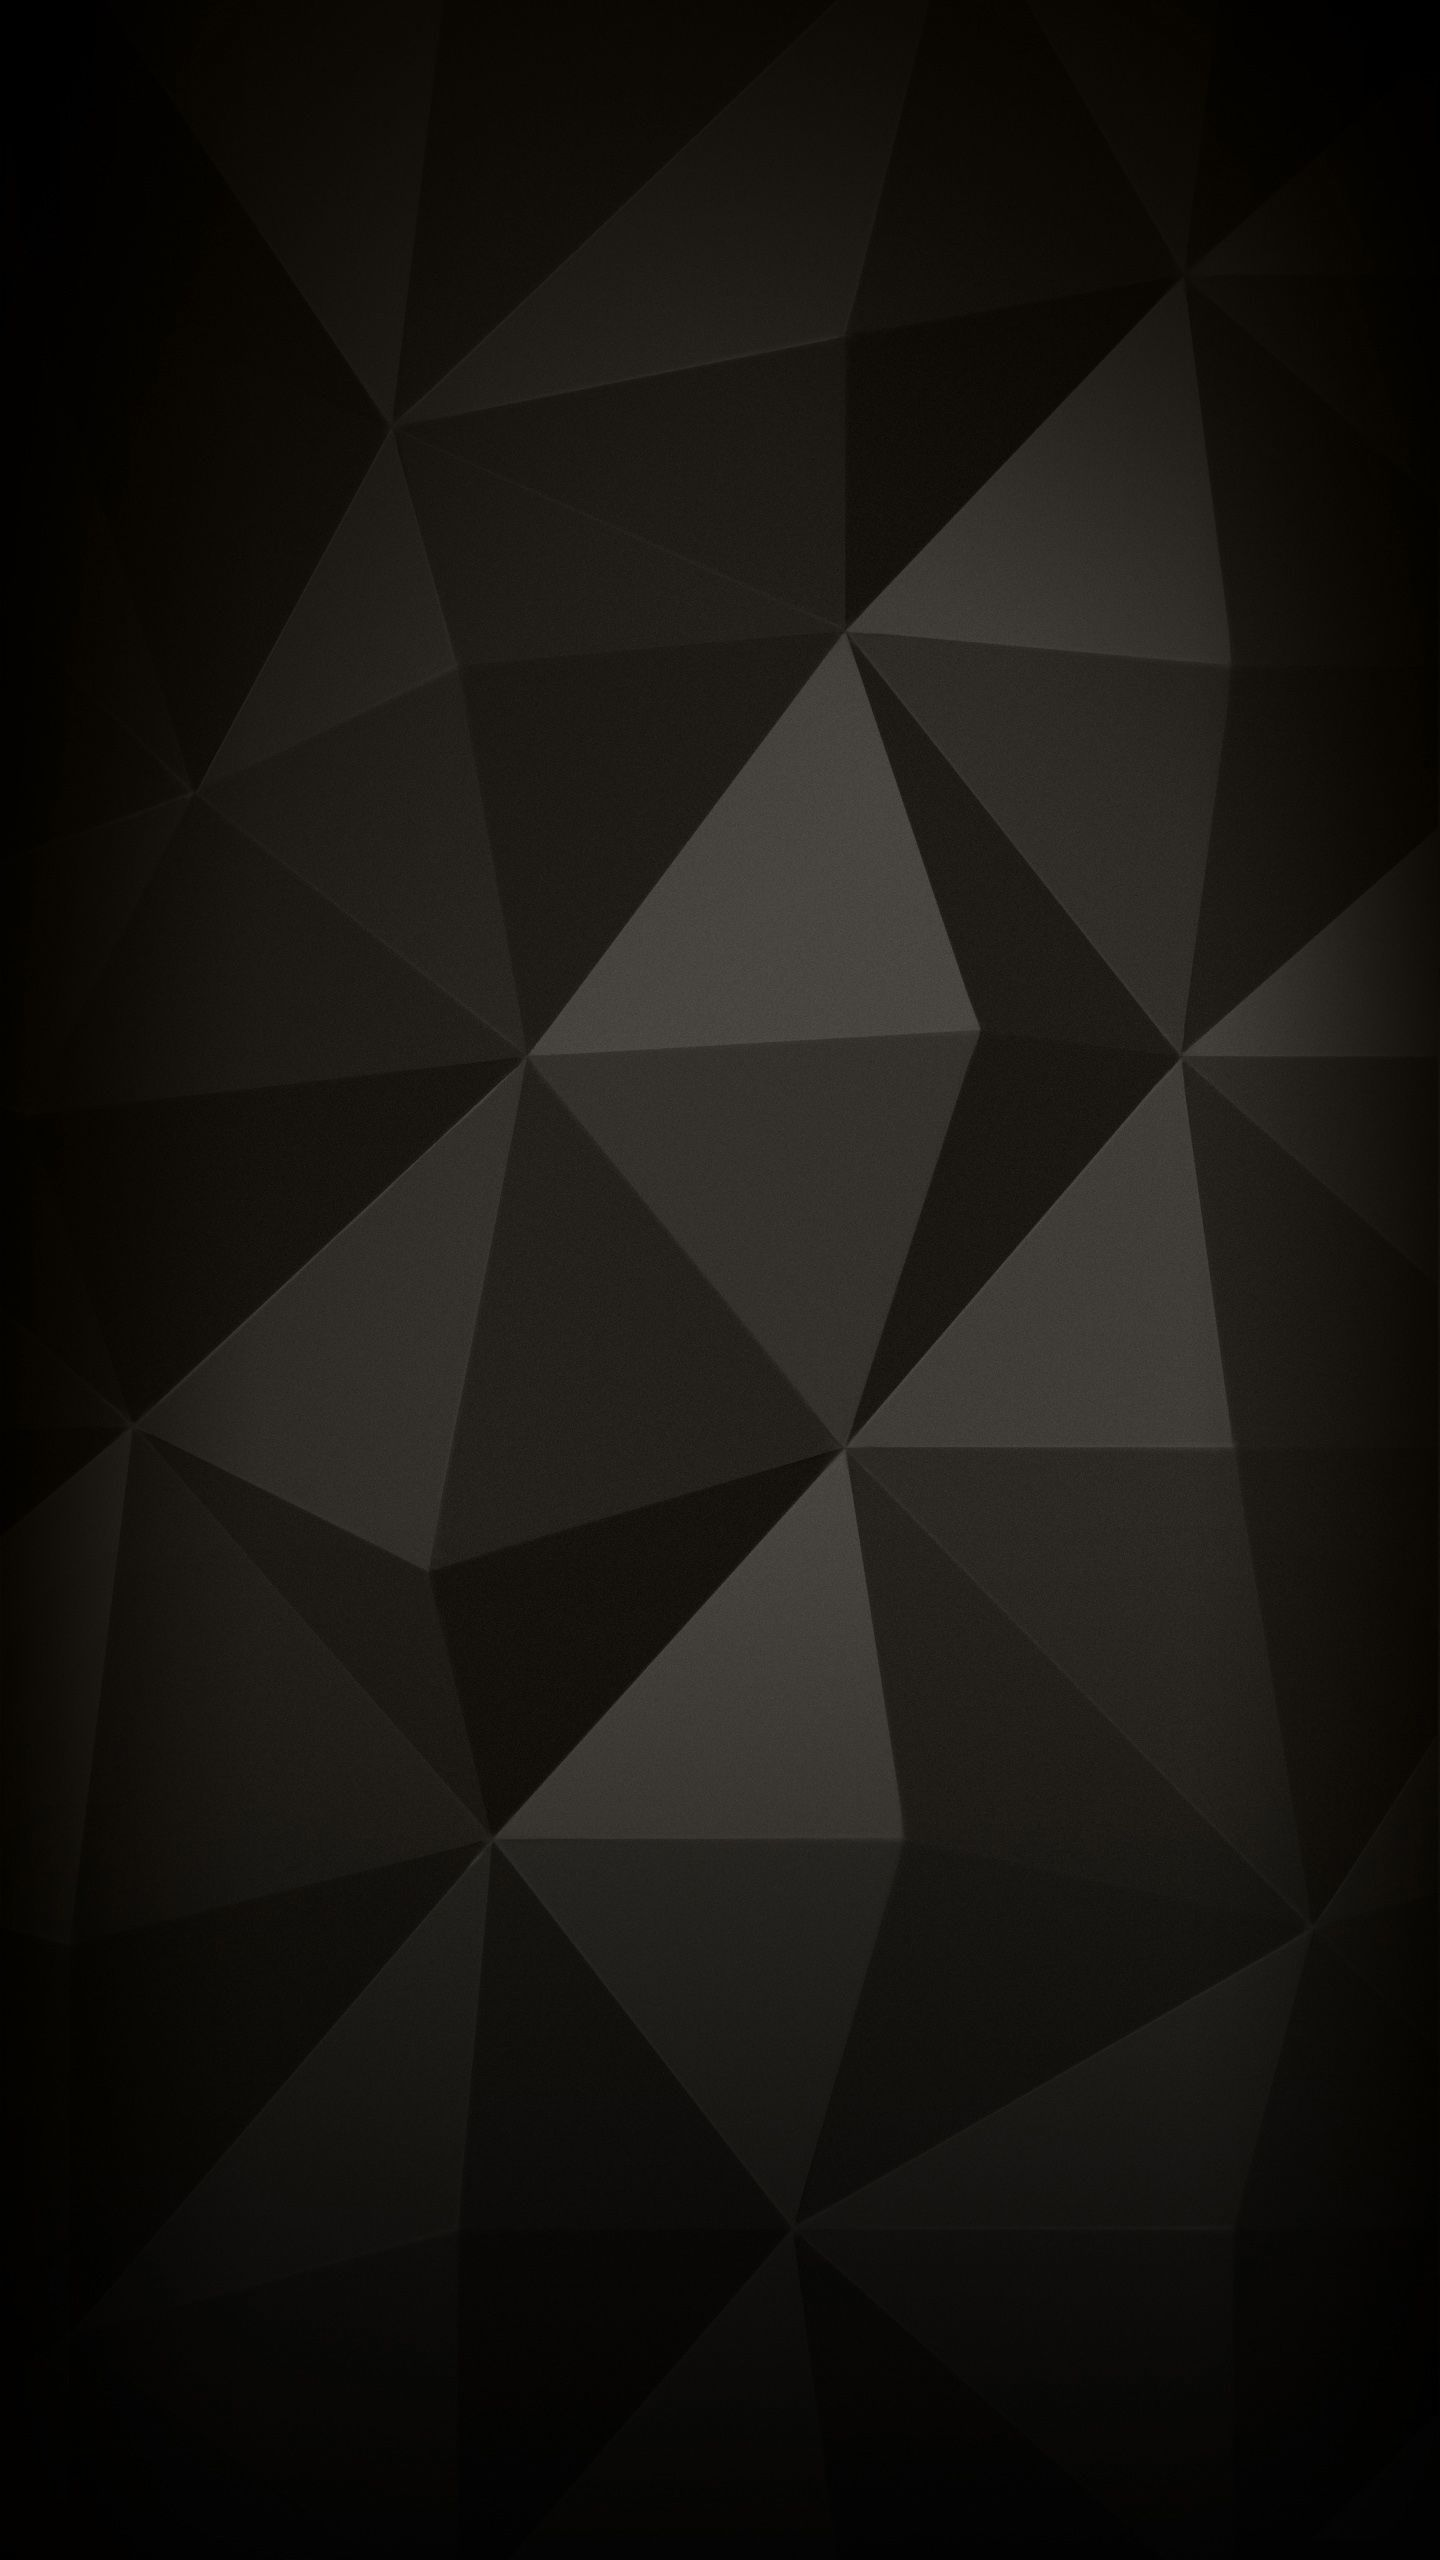 Black Abstract Mobile Phone Wallpaper Dark Wallpaper Iphone Phone Wallpaper Dark Wallpaper